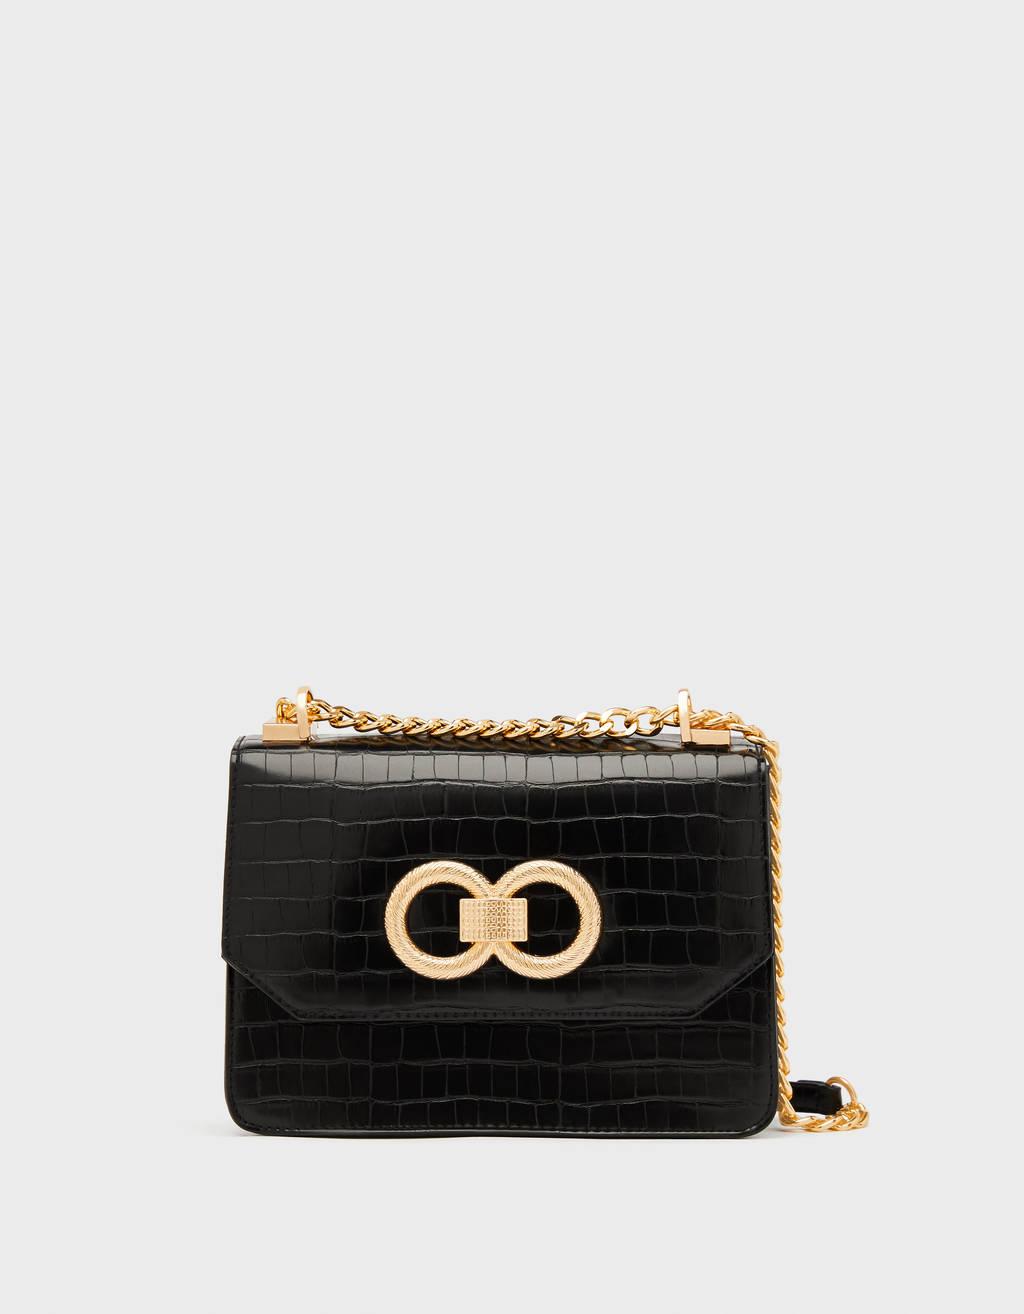 Bolso negro con cadena dorada